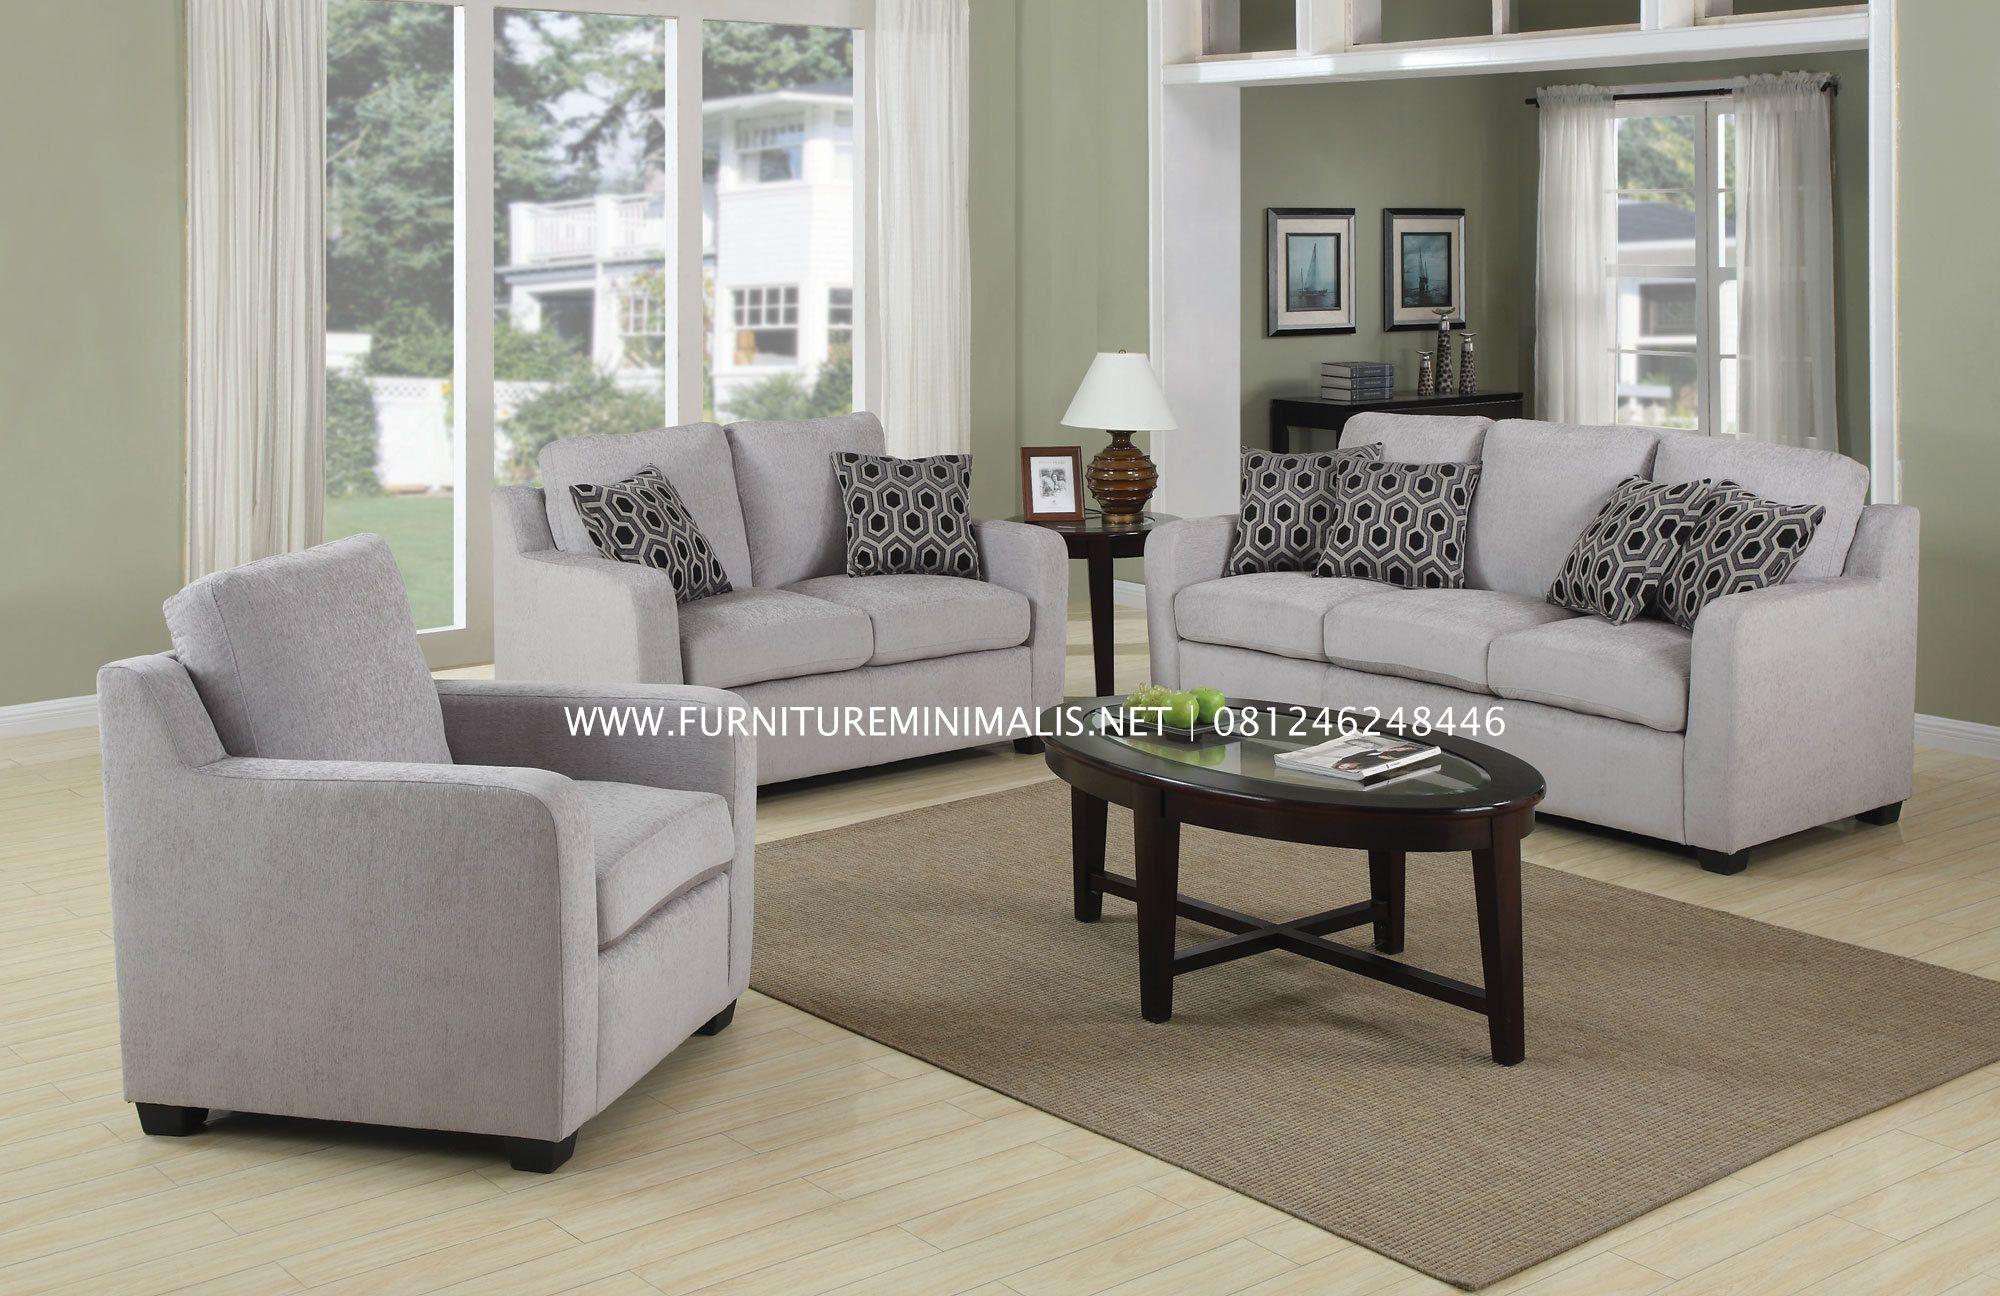 Modern Furniture Jepara kursi tamu sofa minimalis mewah terbaru modern murah - furniture